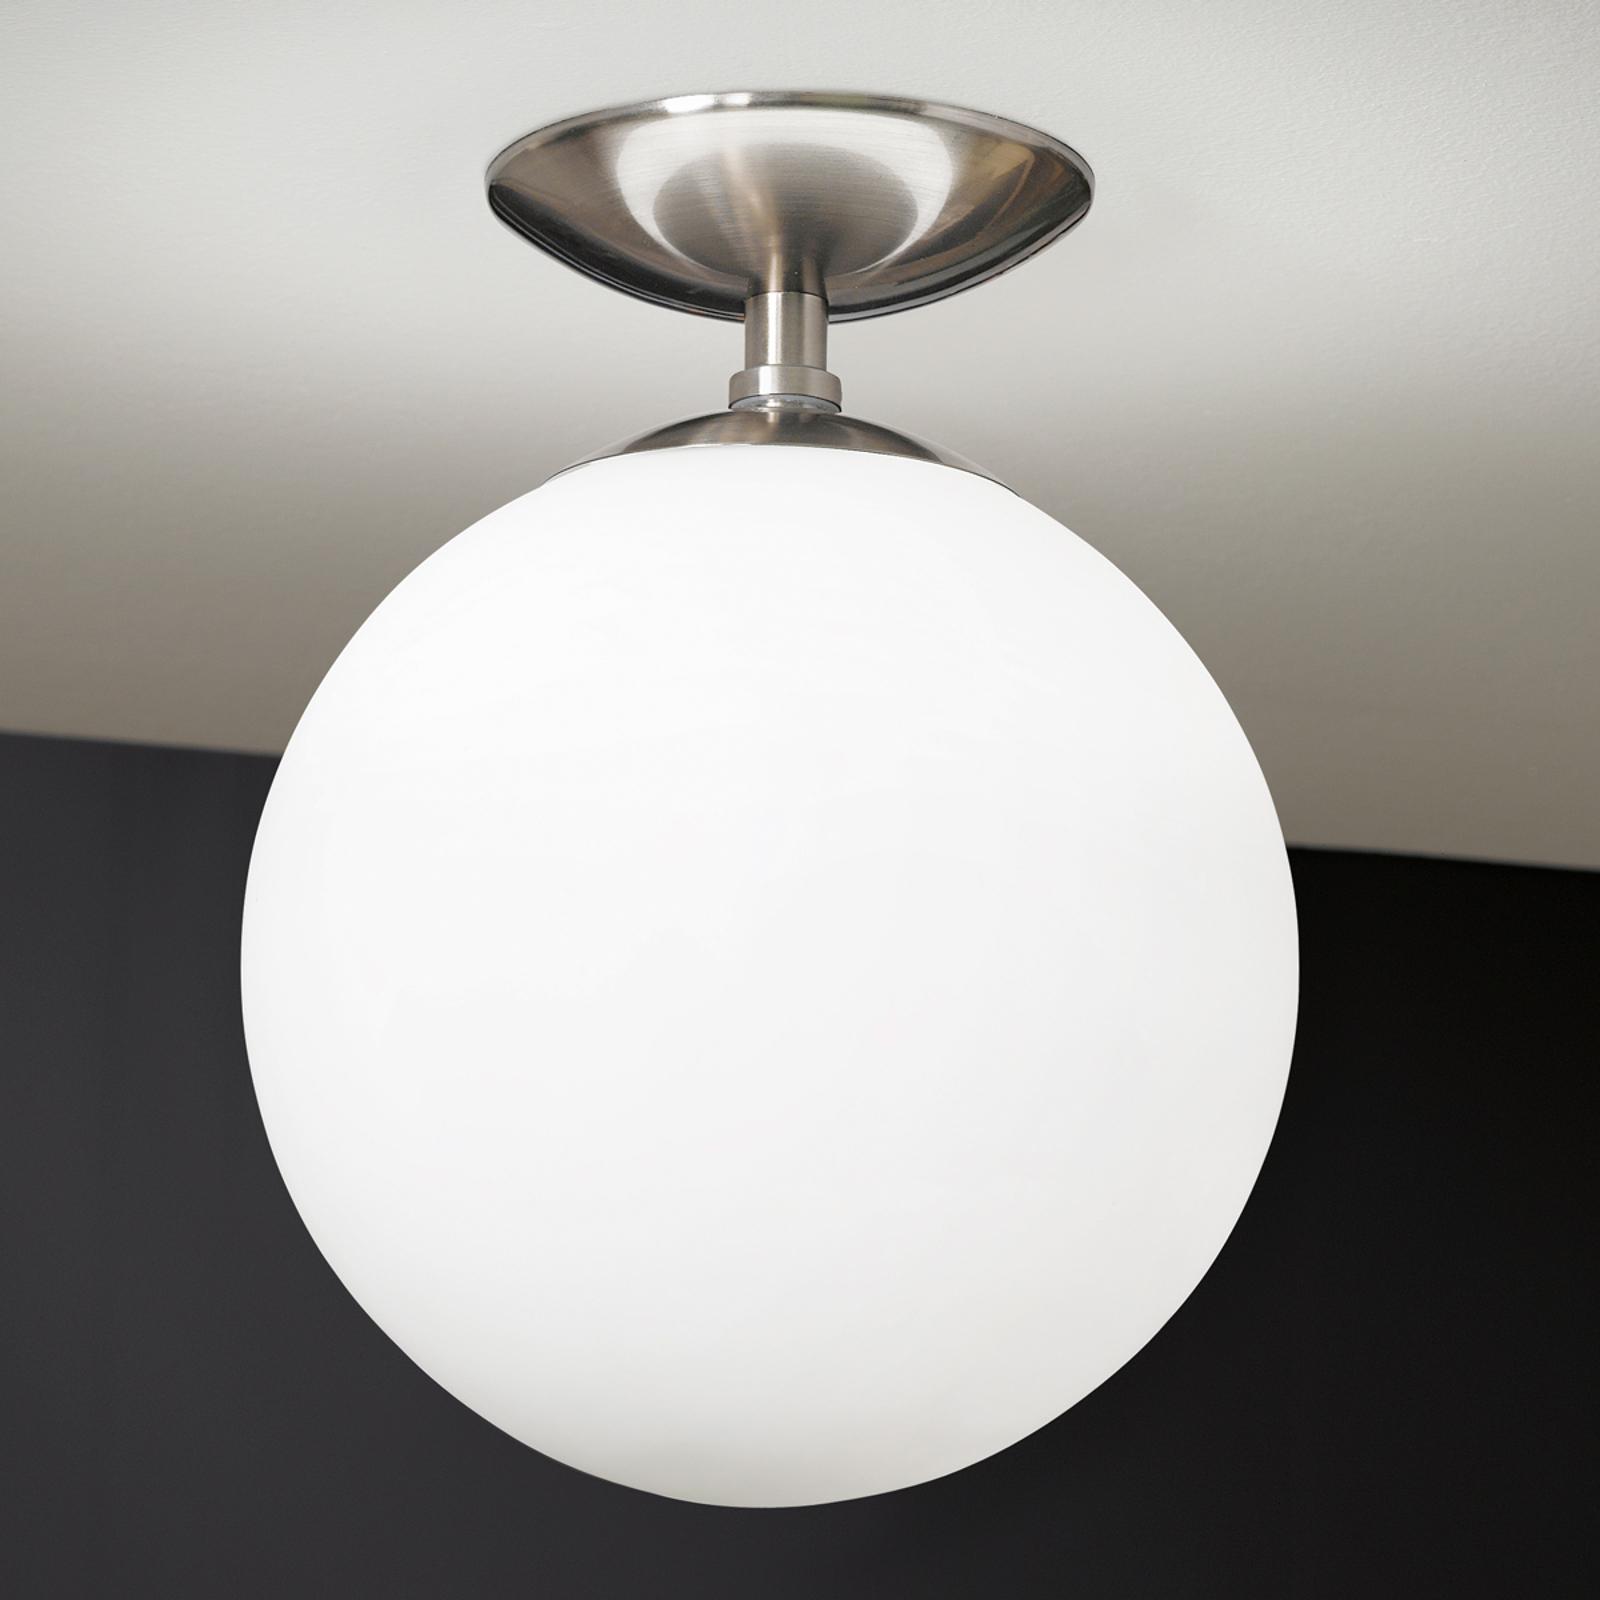 Decentné stropné svietidlo Rondo_3031255_1